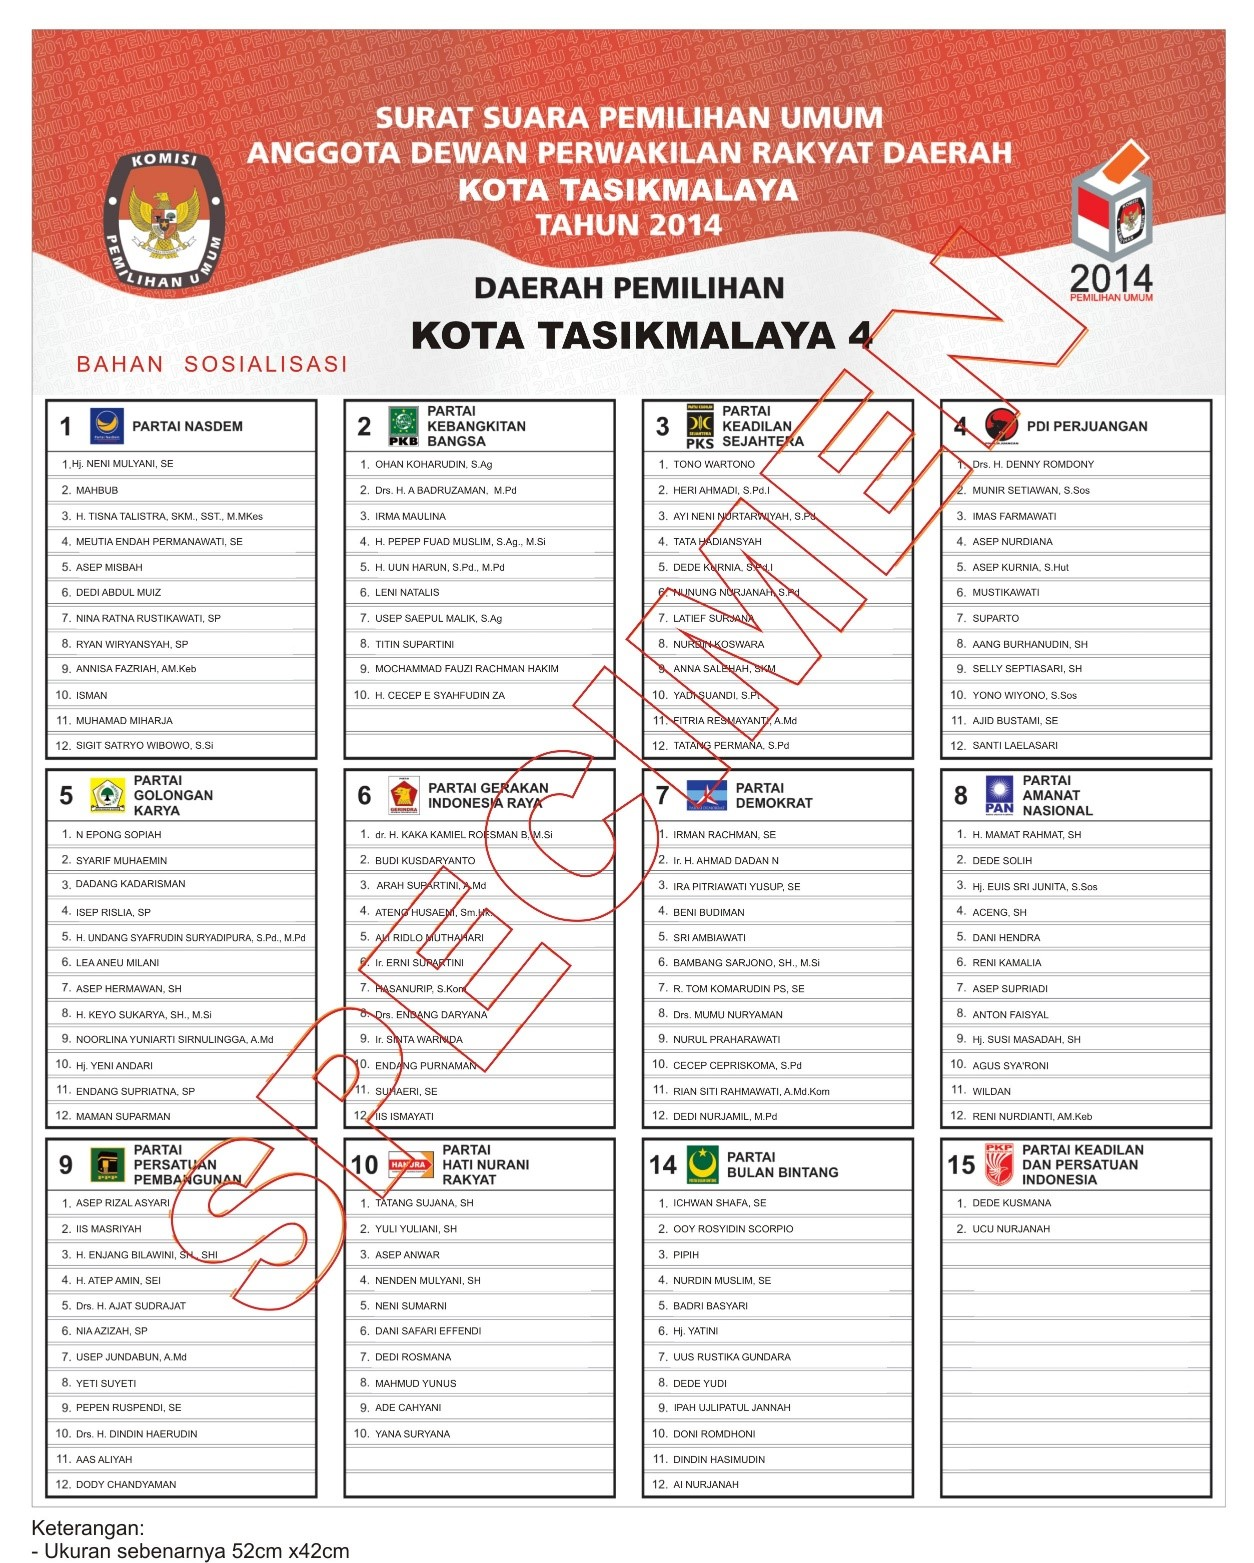 Mengenal Pemilu Di Indonesia